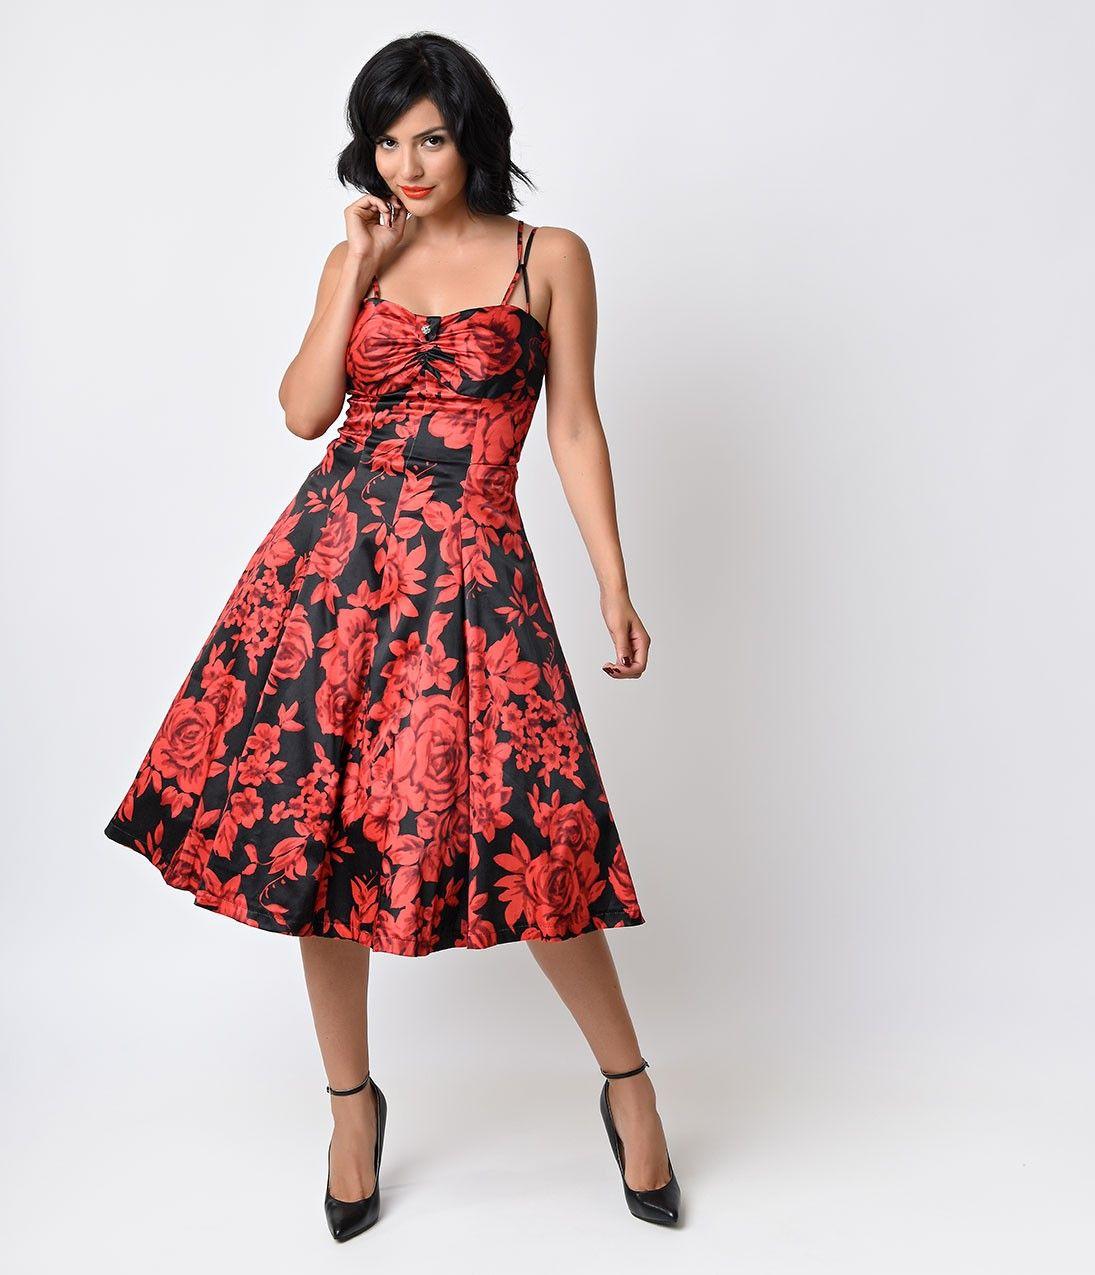 Black u red rose floral carnaby swing dress vintage inspired prom